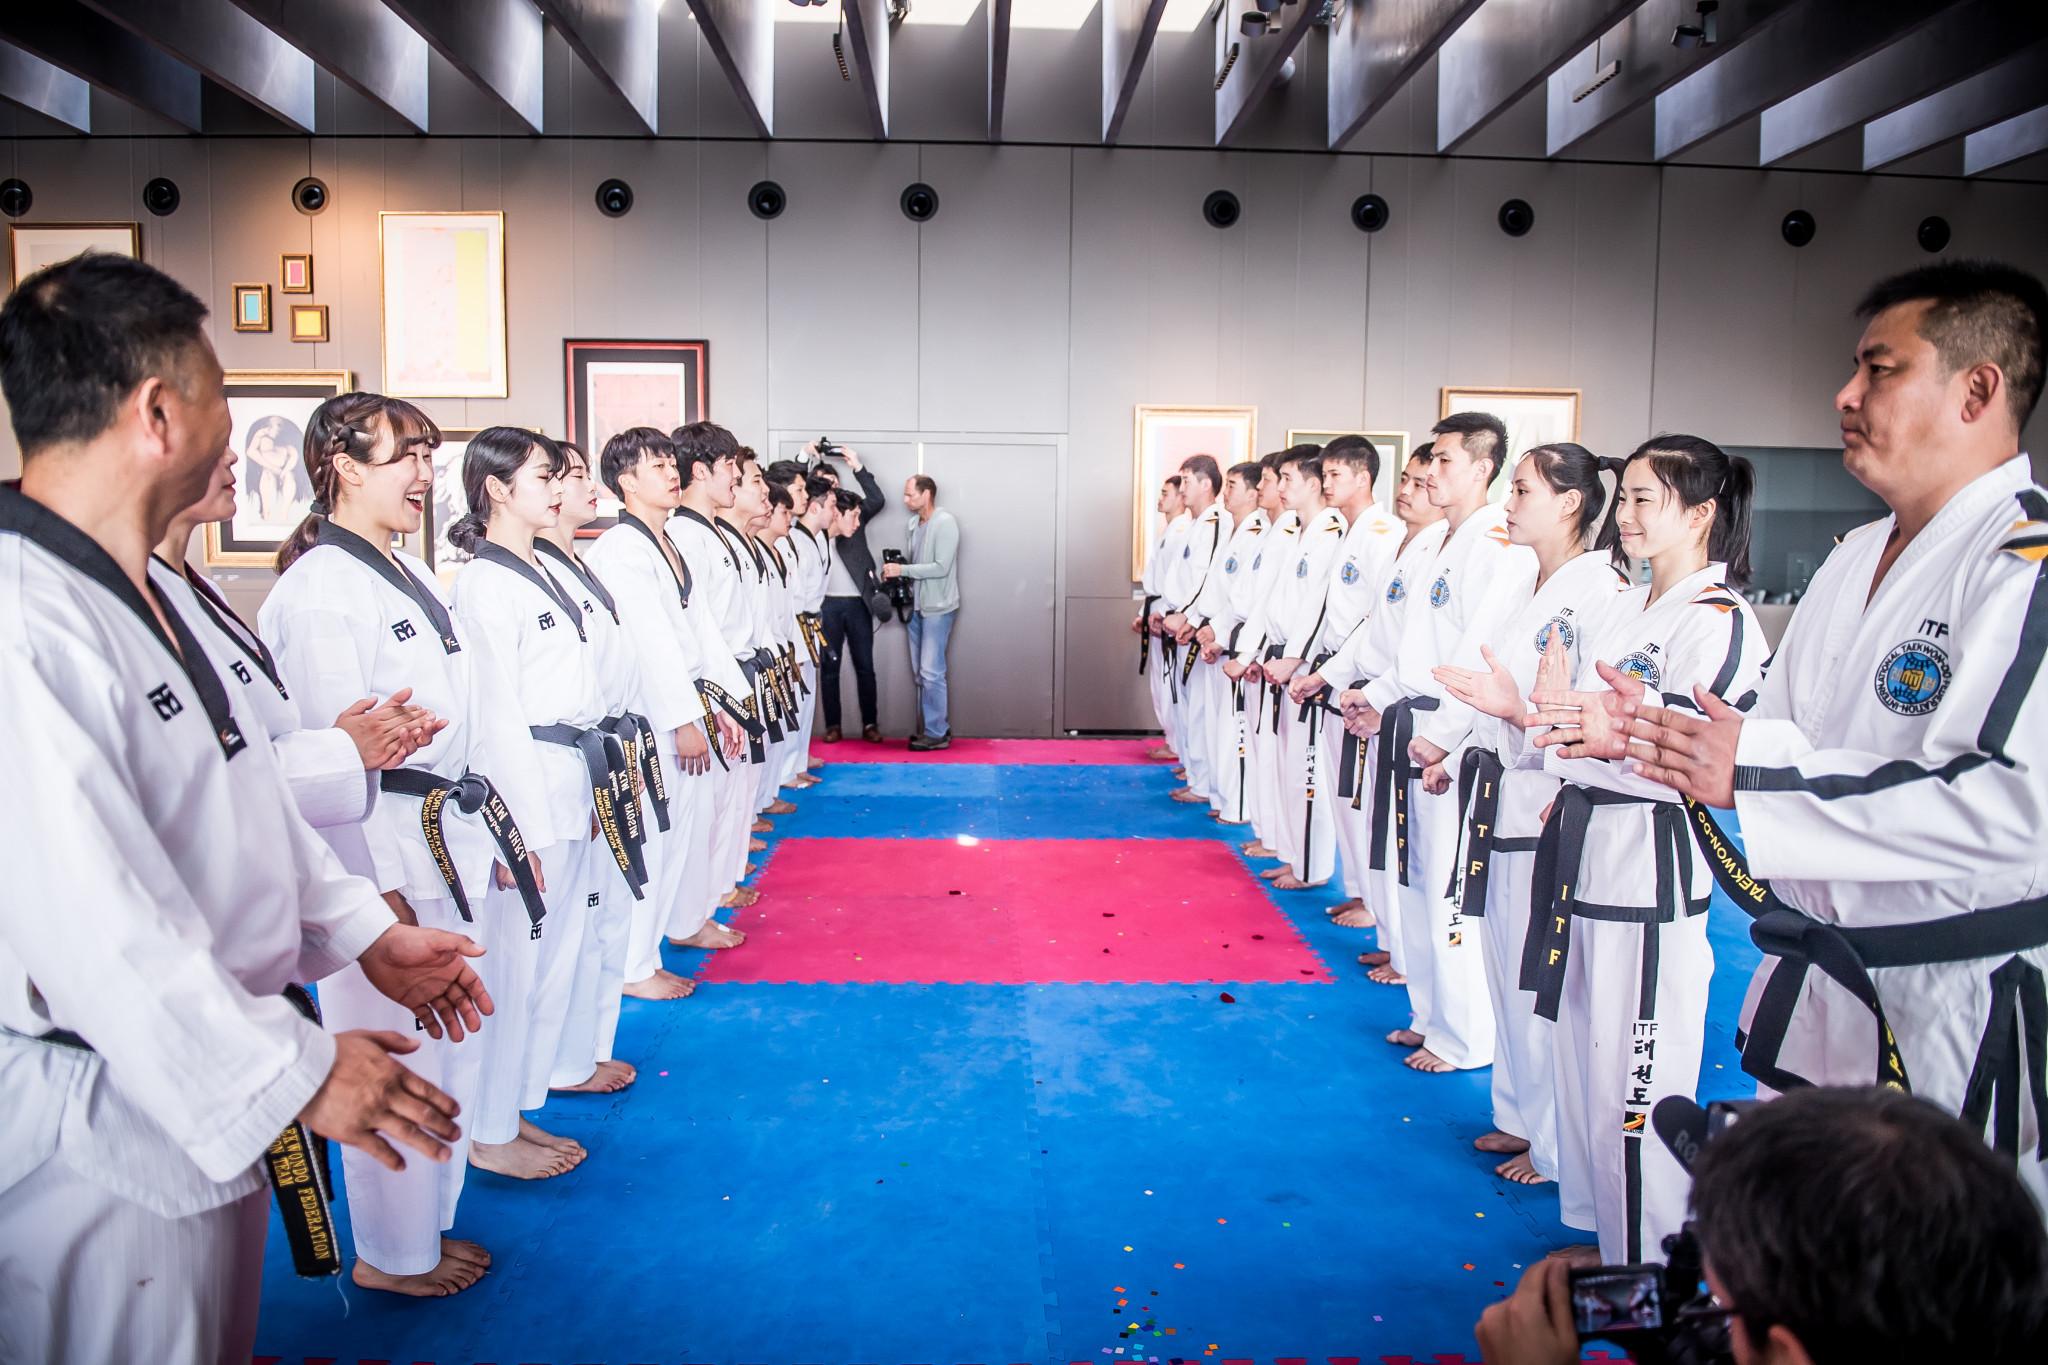 The World Taekwondo team and International Taekwondo team carried out a joint performance ©World Taekwondo